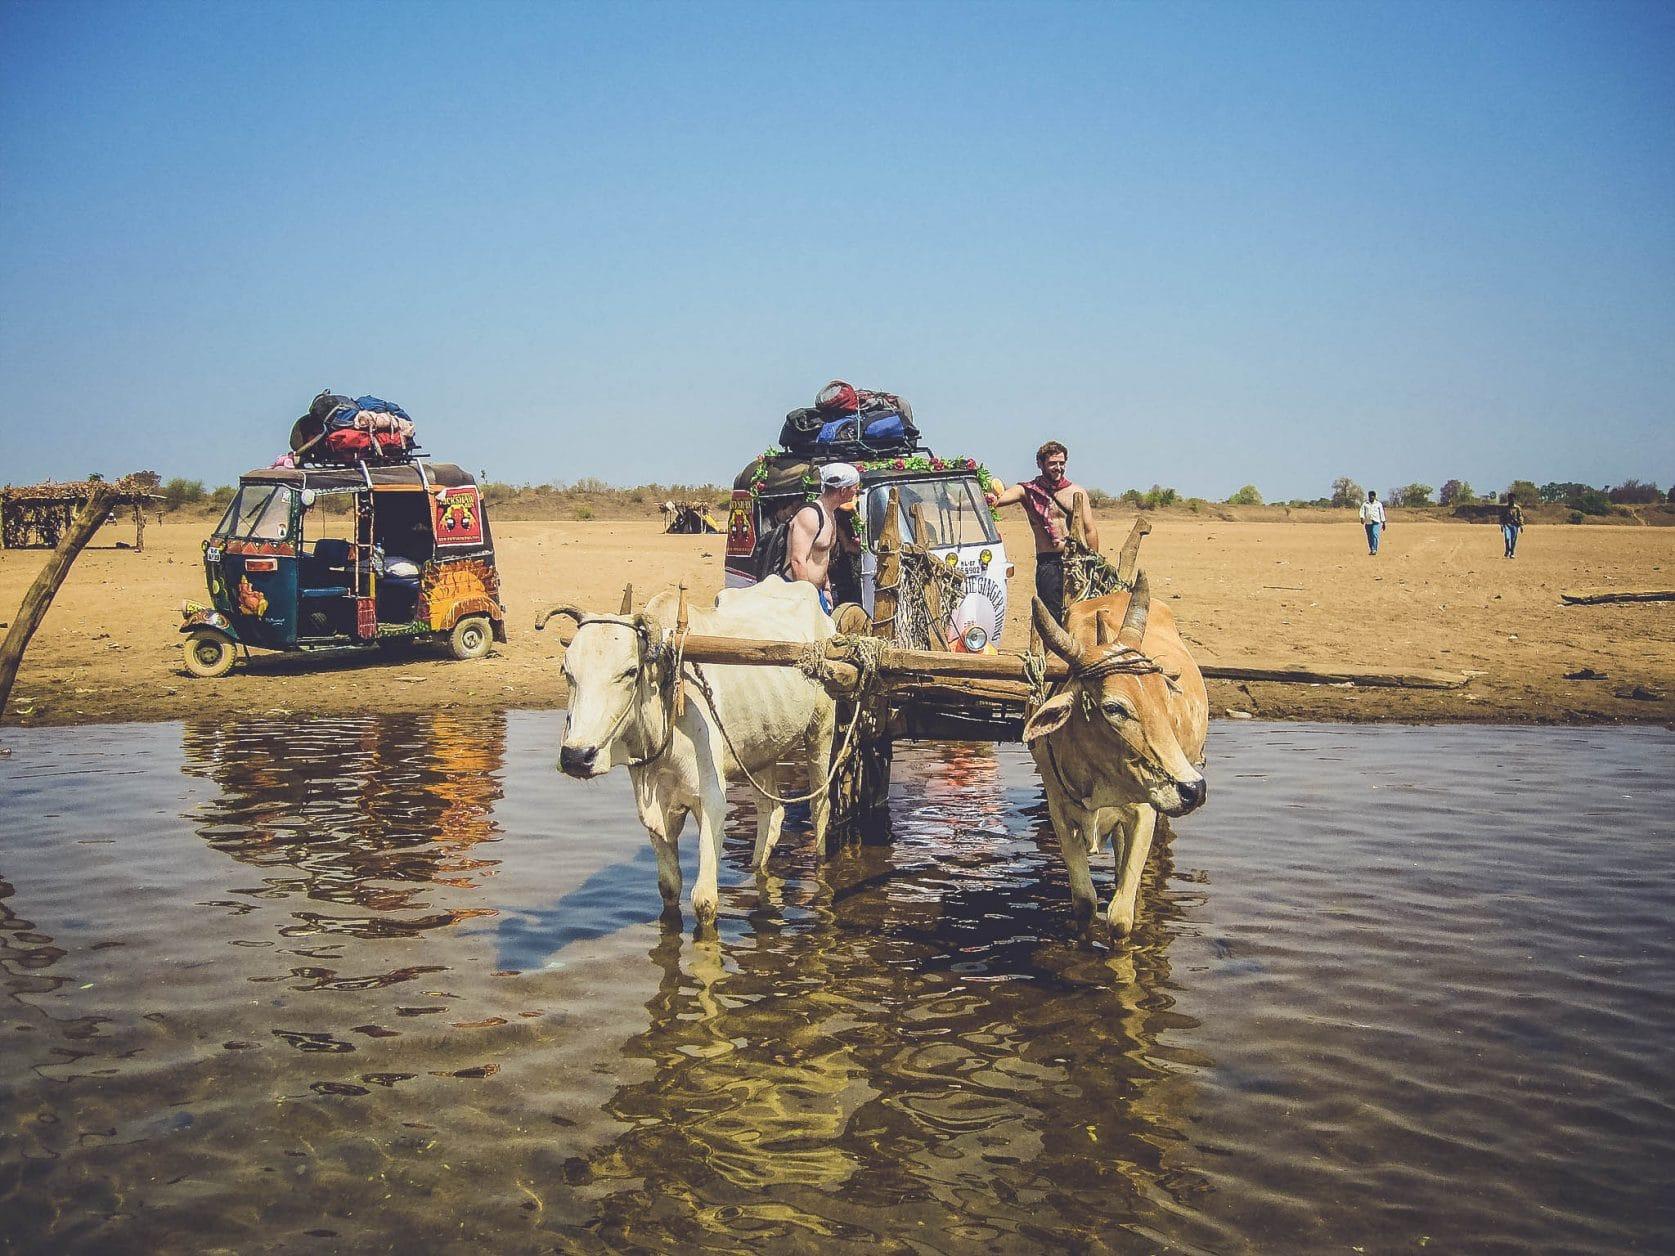 tuktuk kopen in india